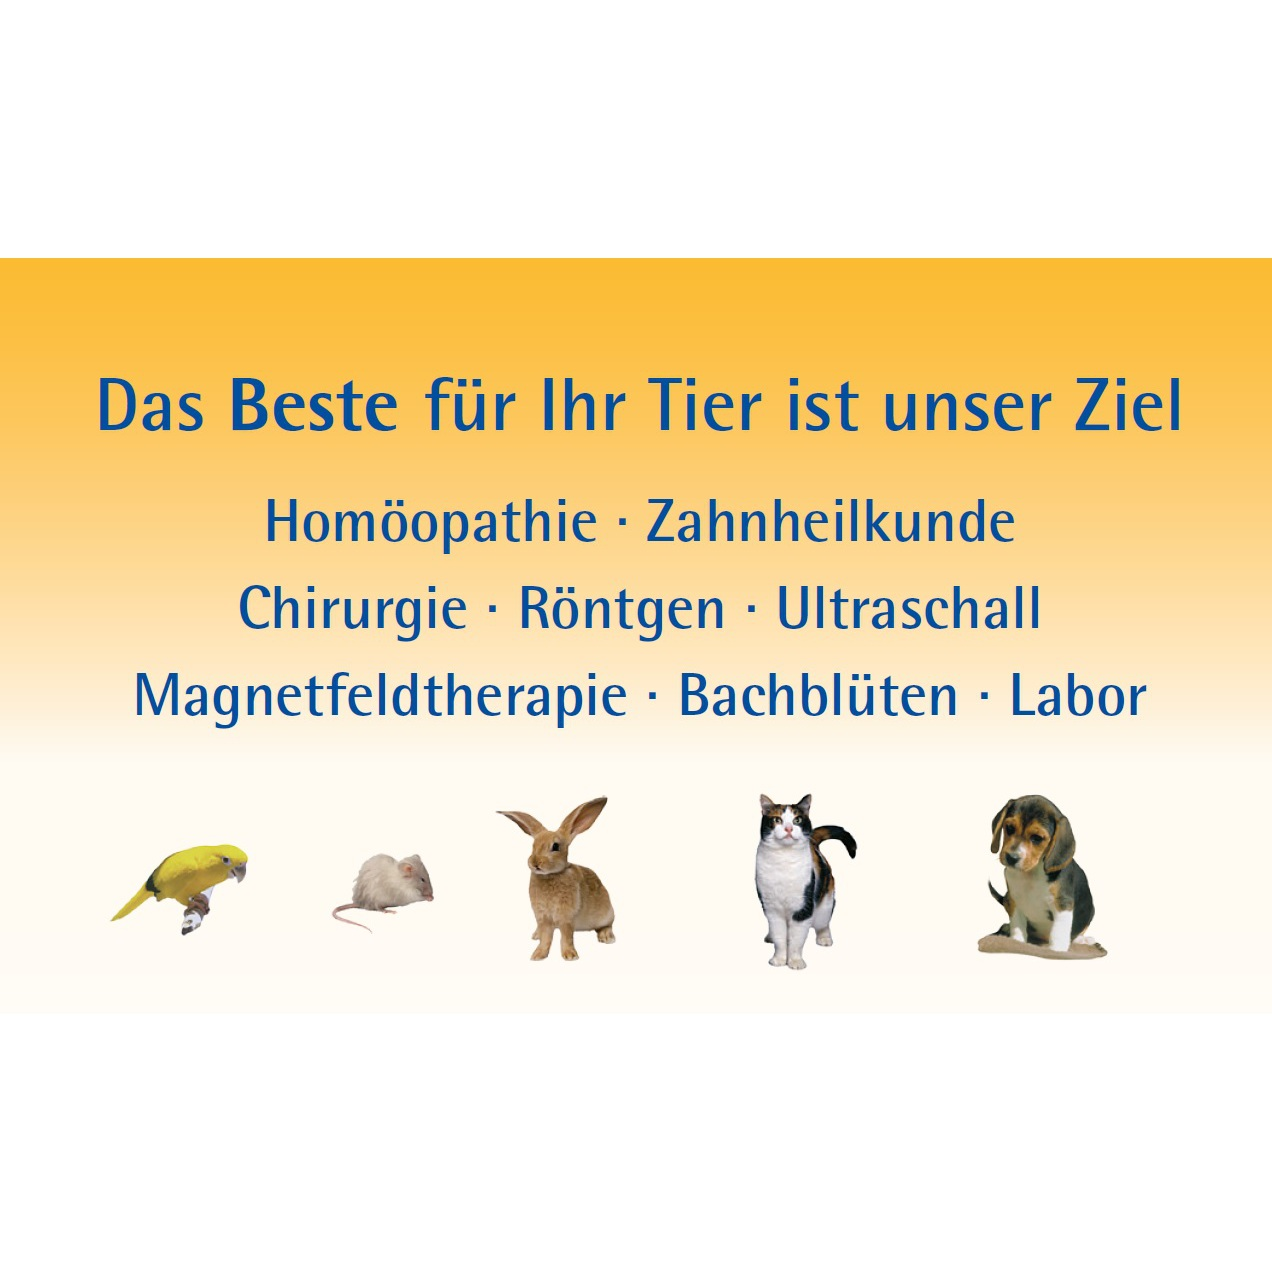 Logo von Tierarztpraxis Dr. med. vet. Ute Lederer